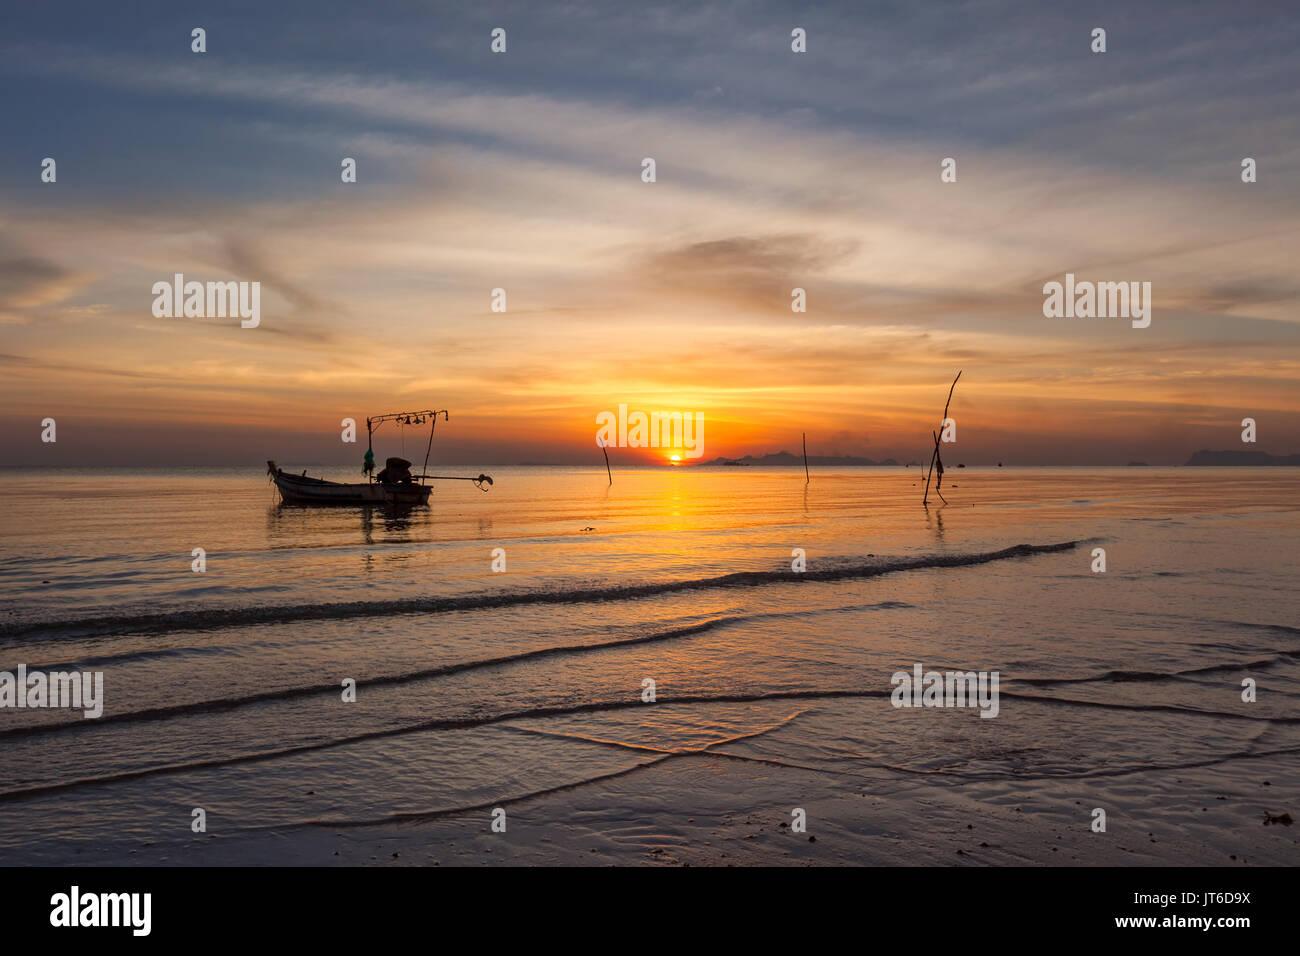 Fishing boat silhouette during a colorful sunset at Nathon beach, Laem Yai, Koh Samui, Thailand - Stock Image